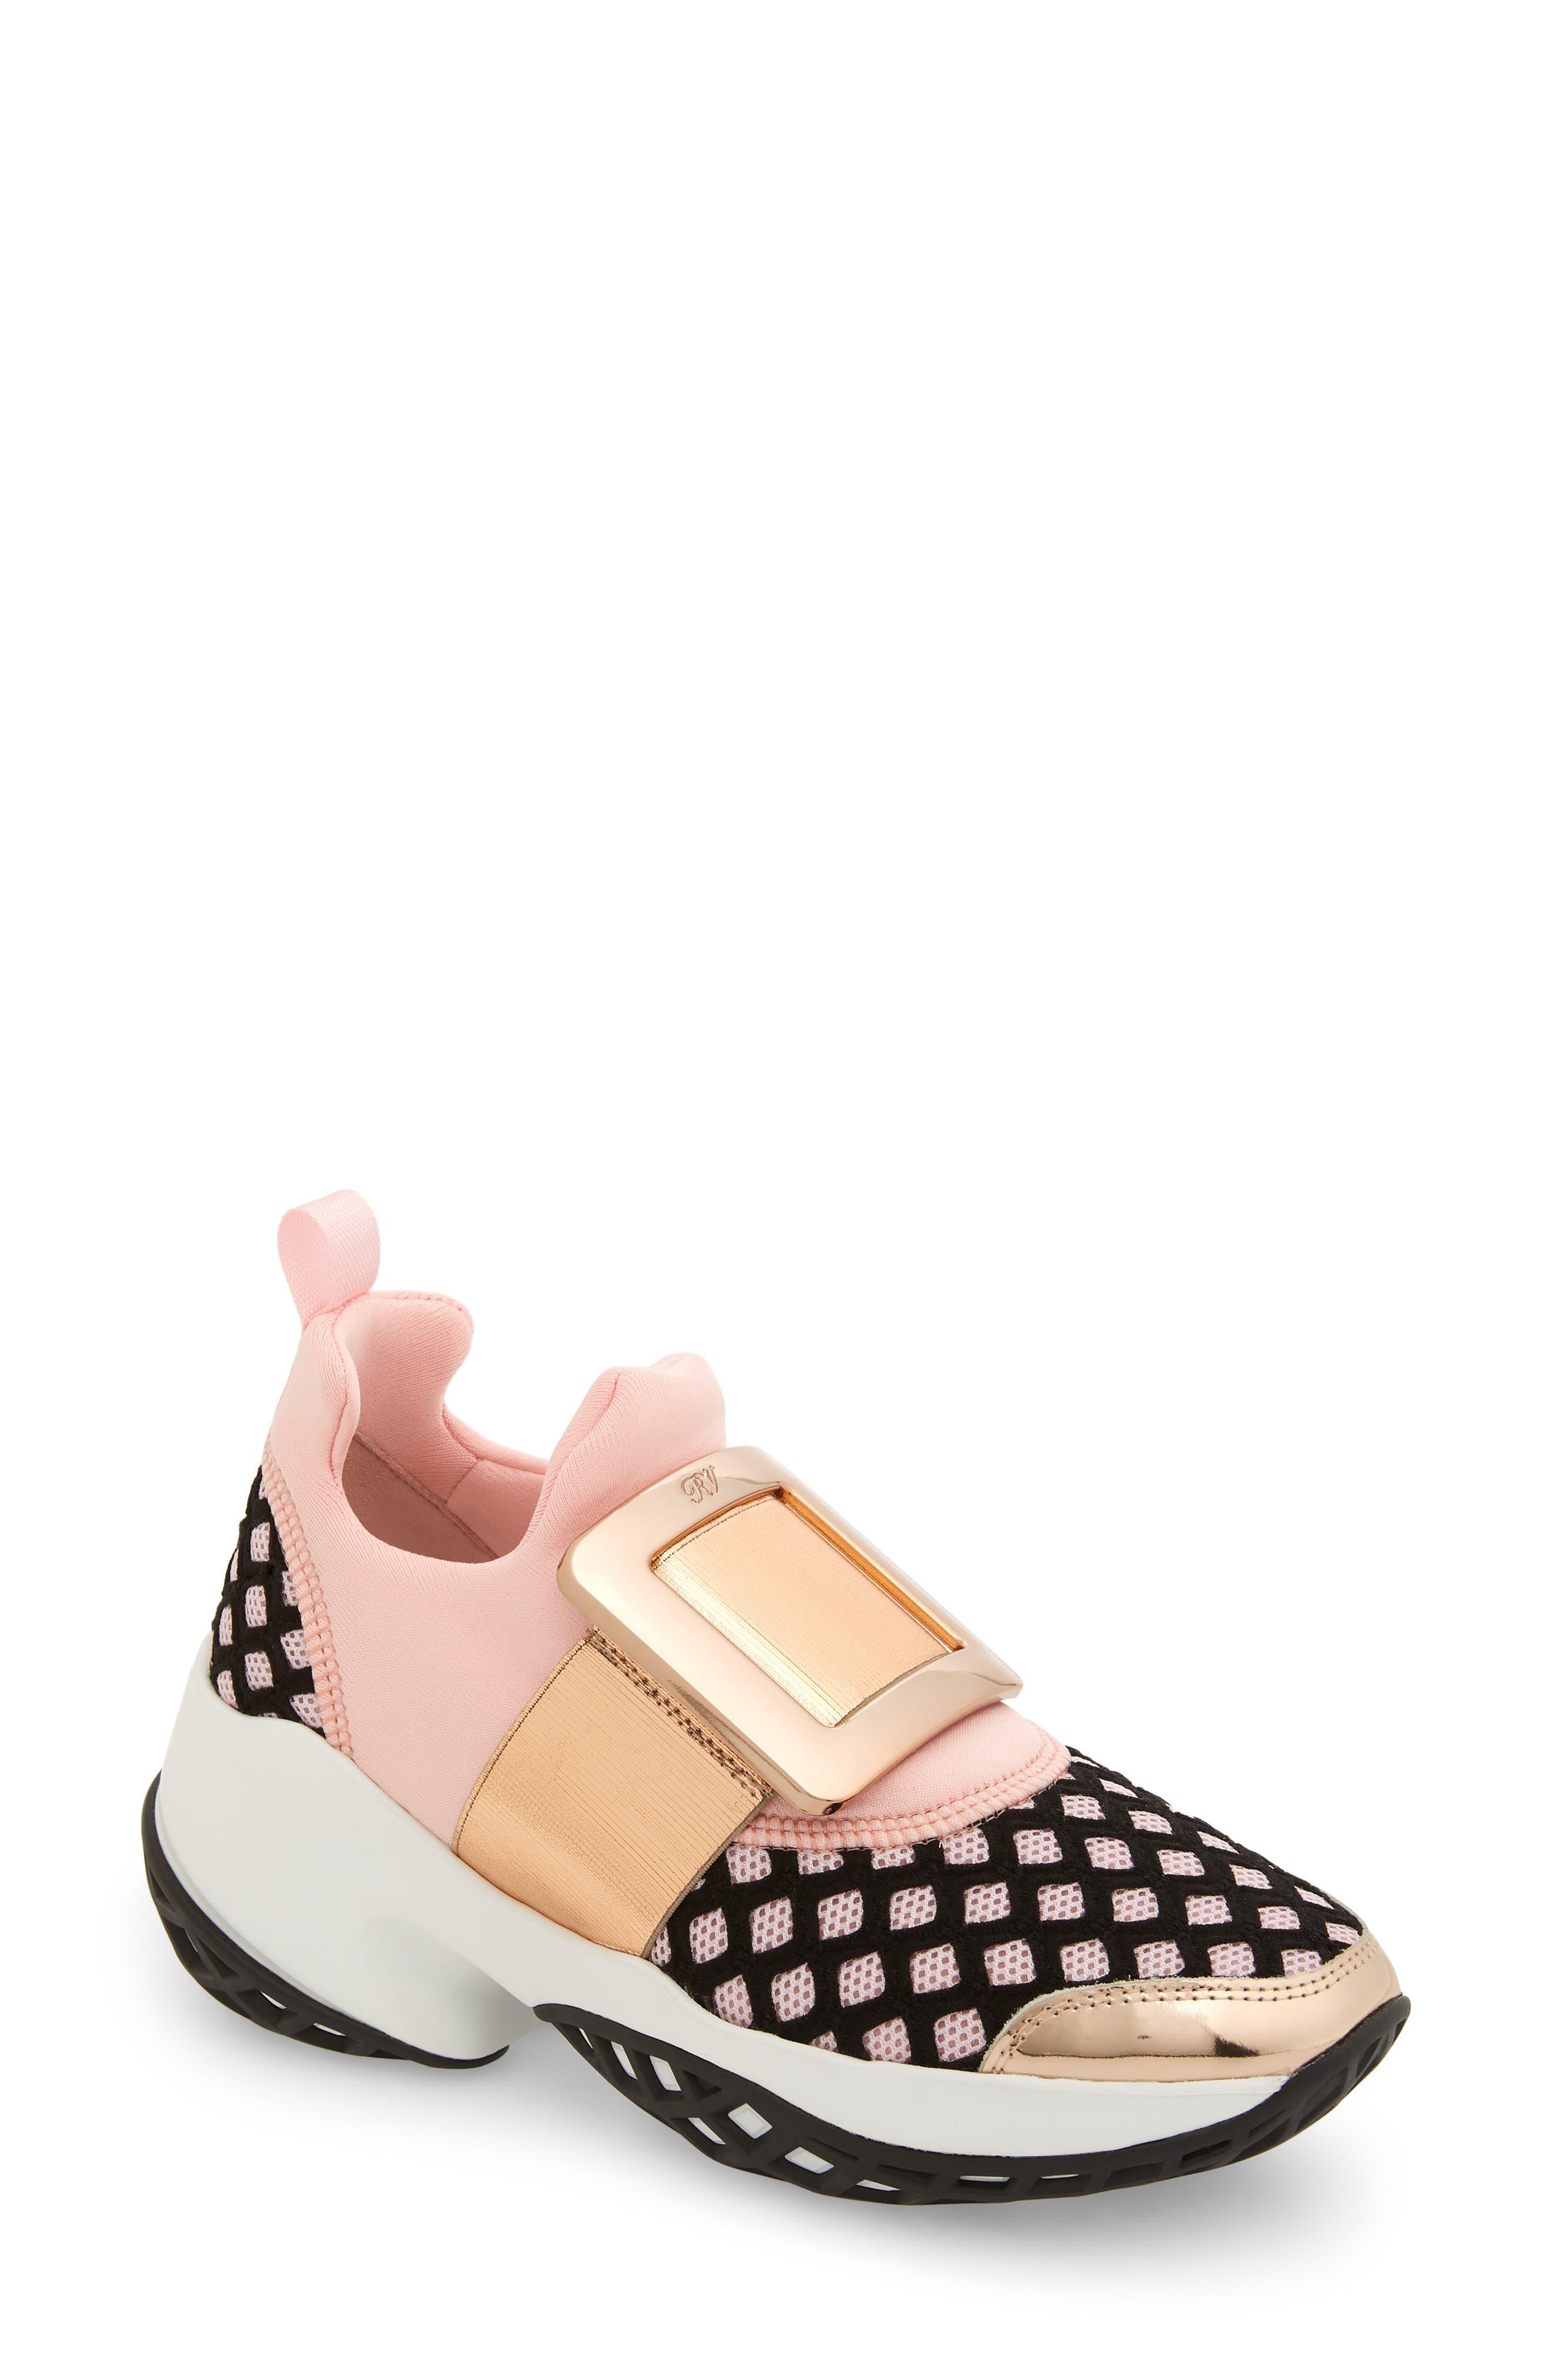 Roger Vivier Sneakers Viv Buckle Slip-On Sneaker